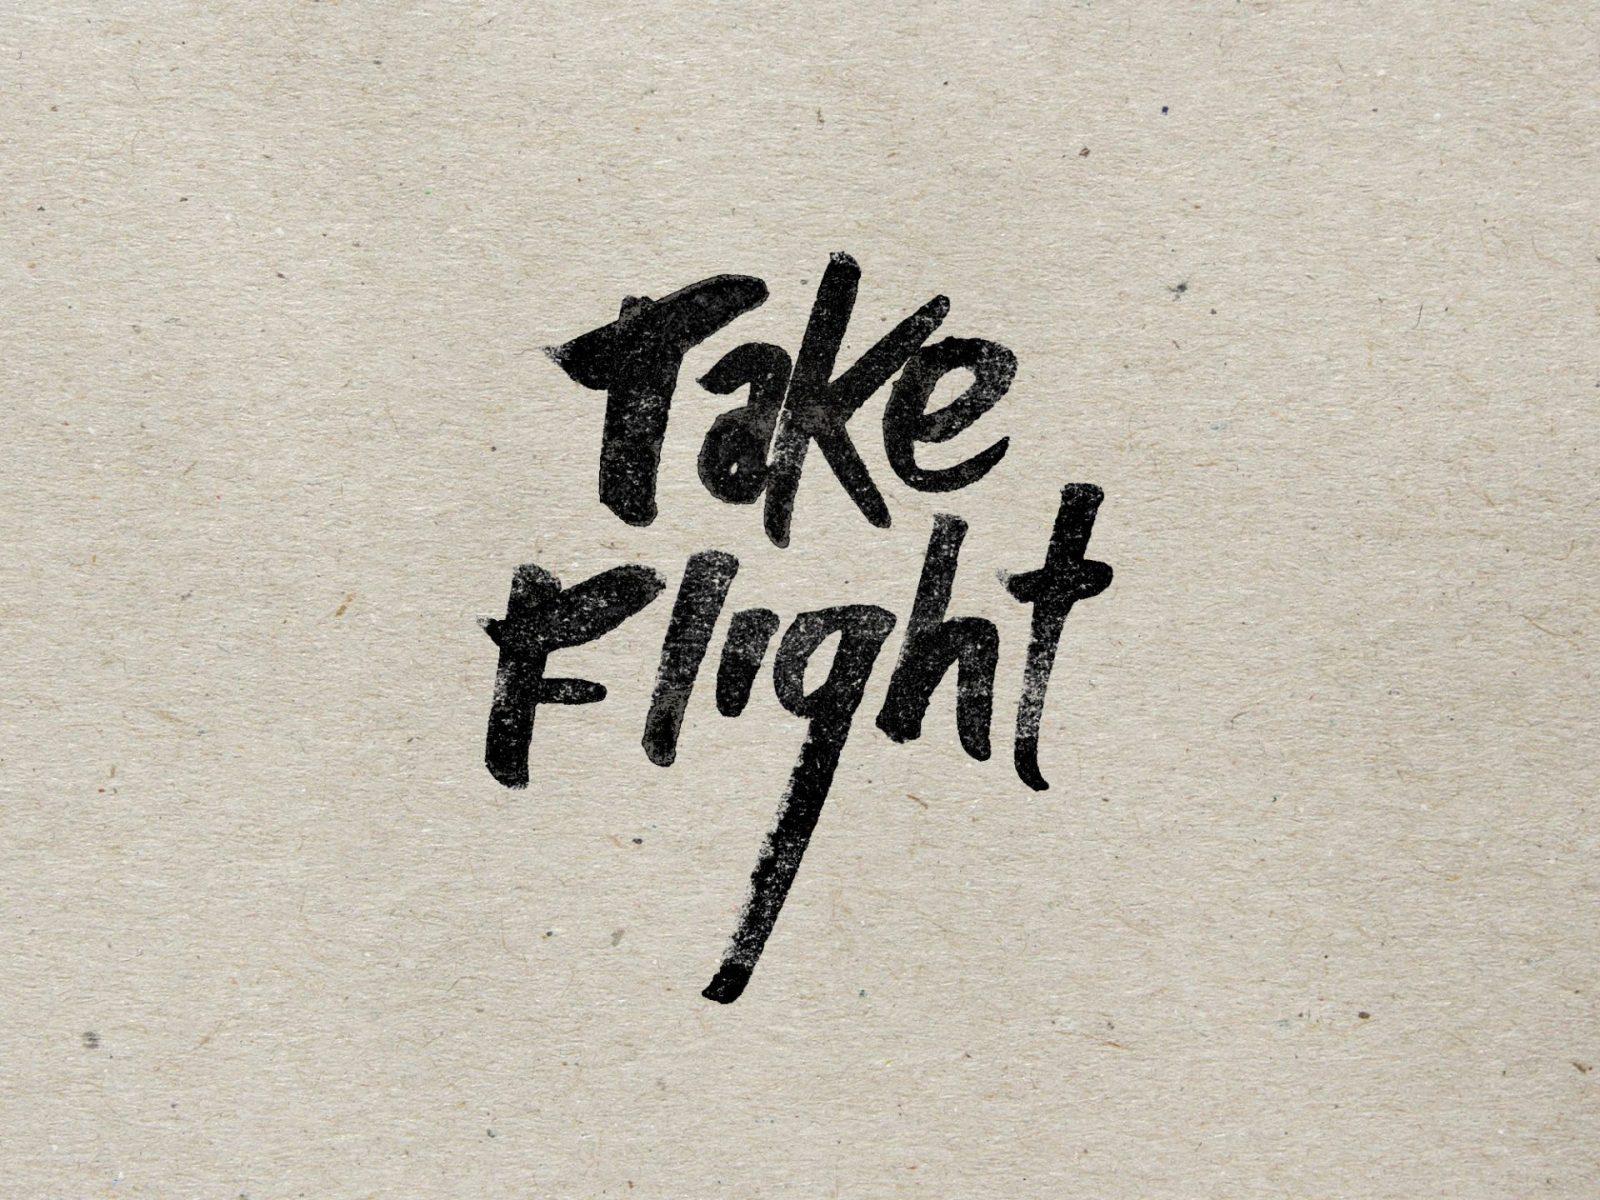 TakeFlight2